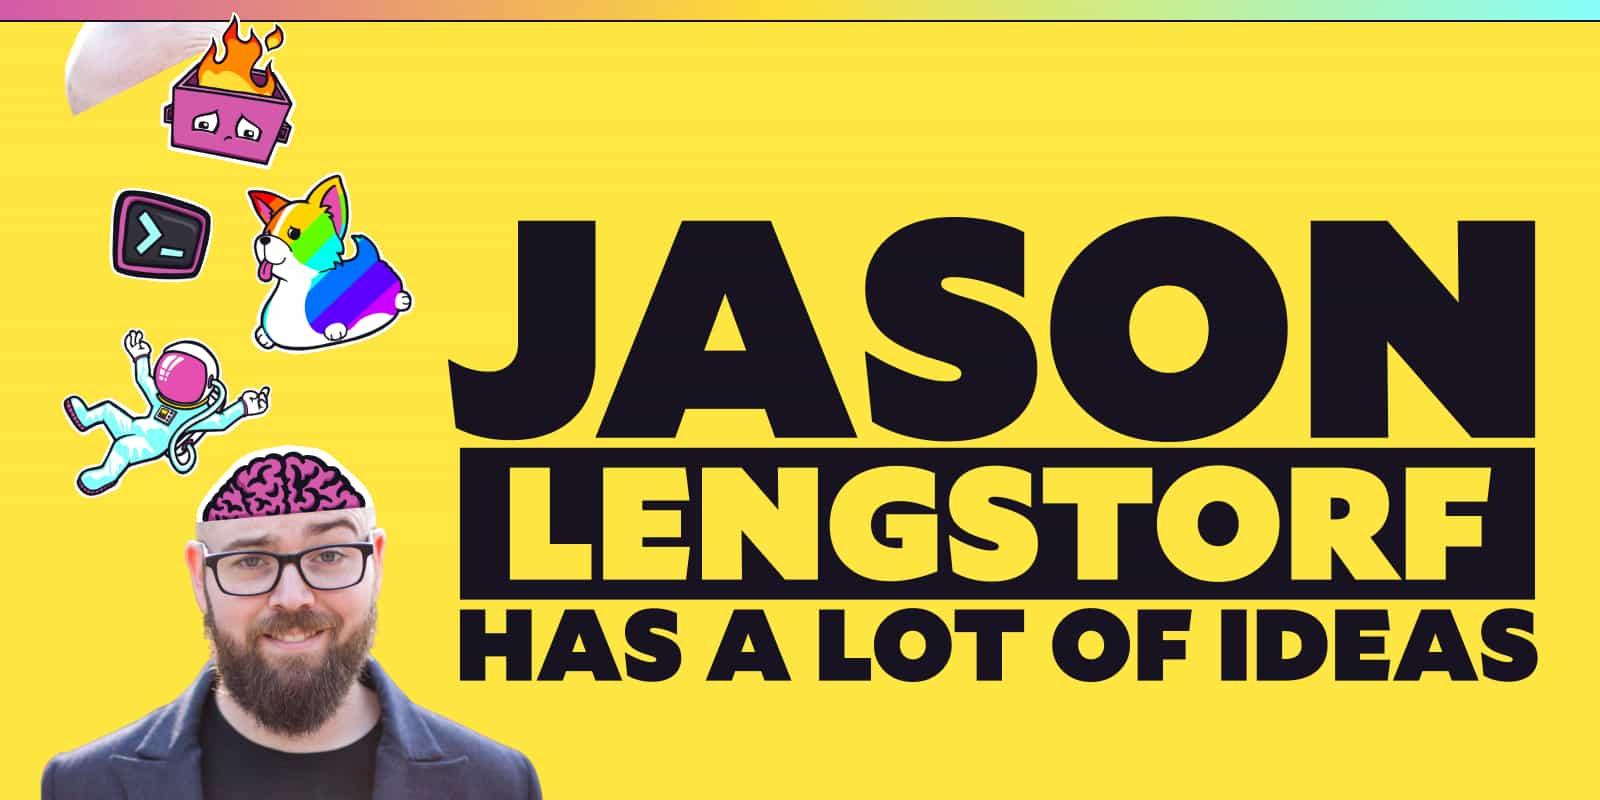 Jason Lengstorf has a lot of ideas.